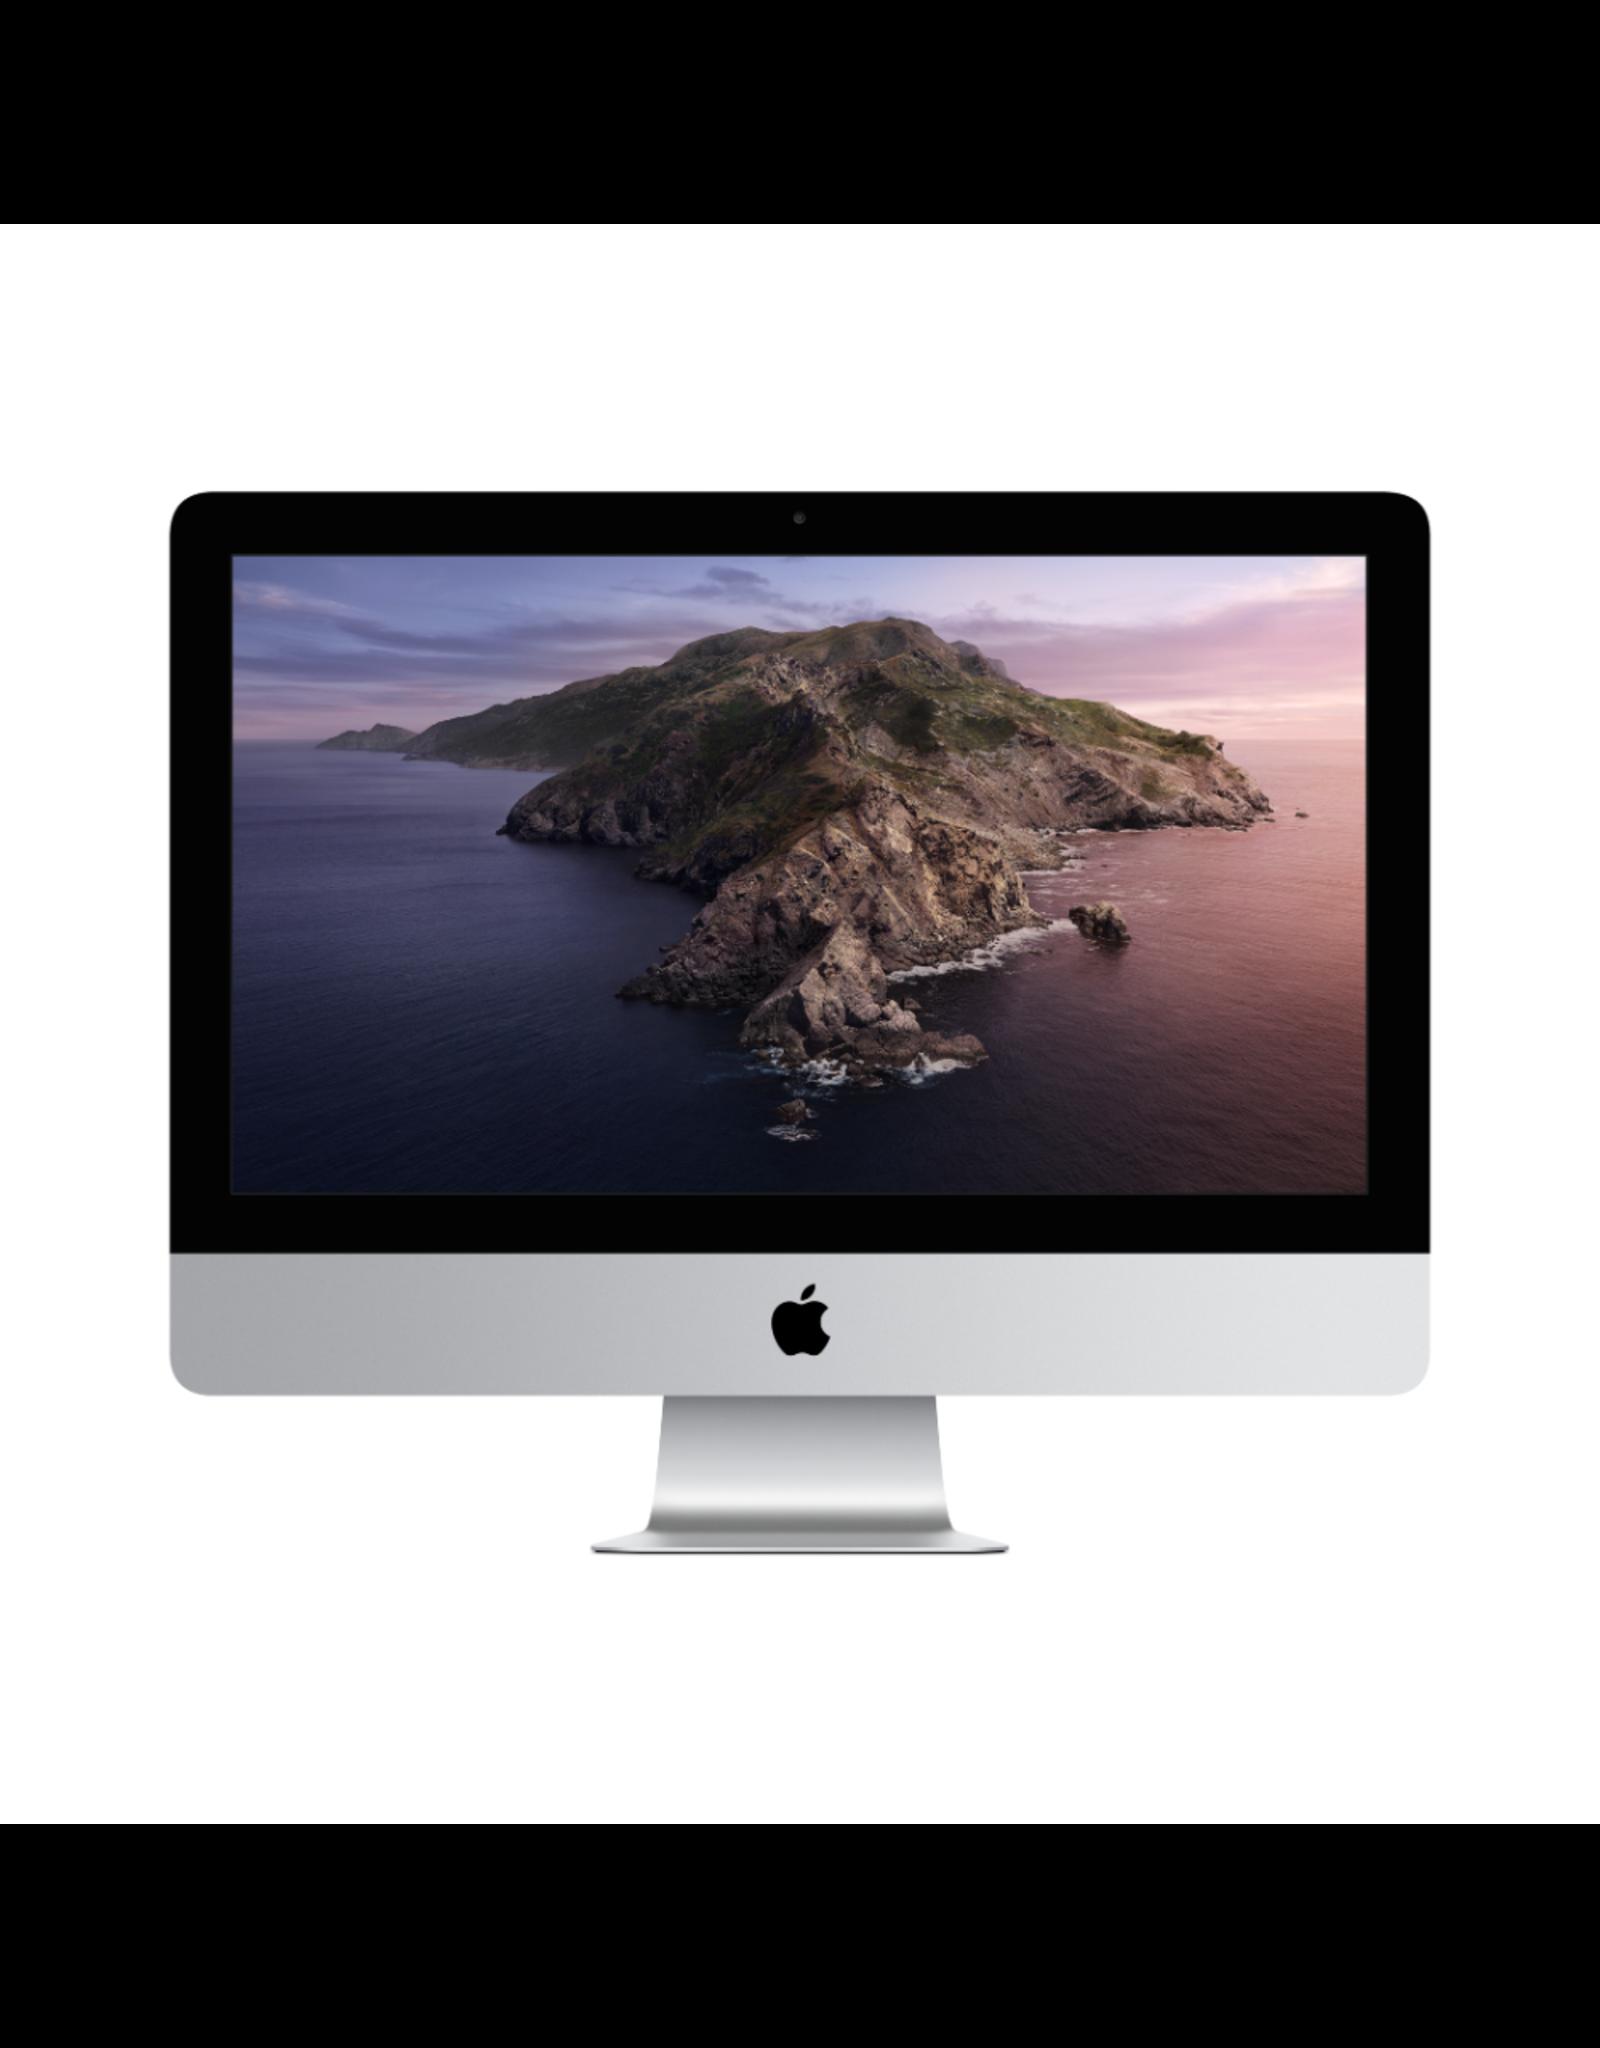 Apple Superseded - 21.5-inch iMac Retina 4K 3.6GHz quad-core 8th-generation Intel Core i3/8GB/256GB SSD/Radeon Pro 555X 2GB